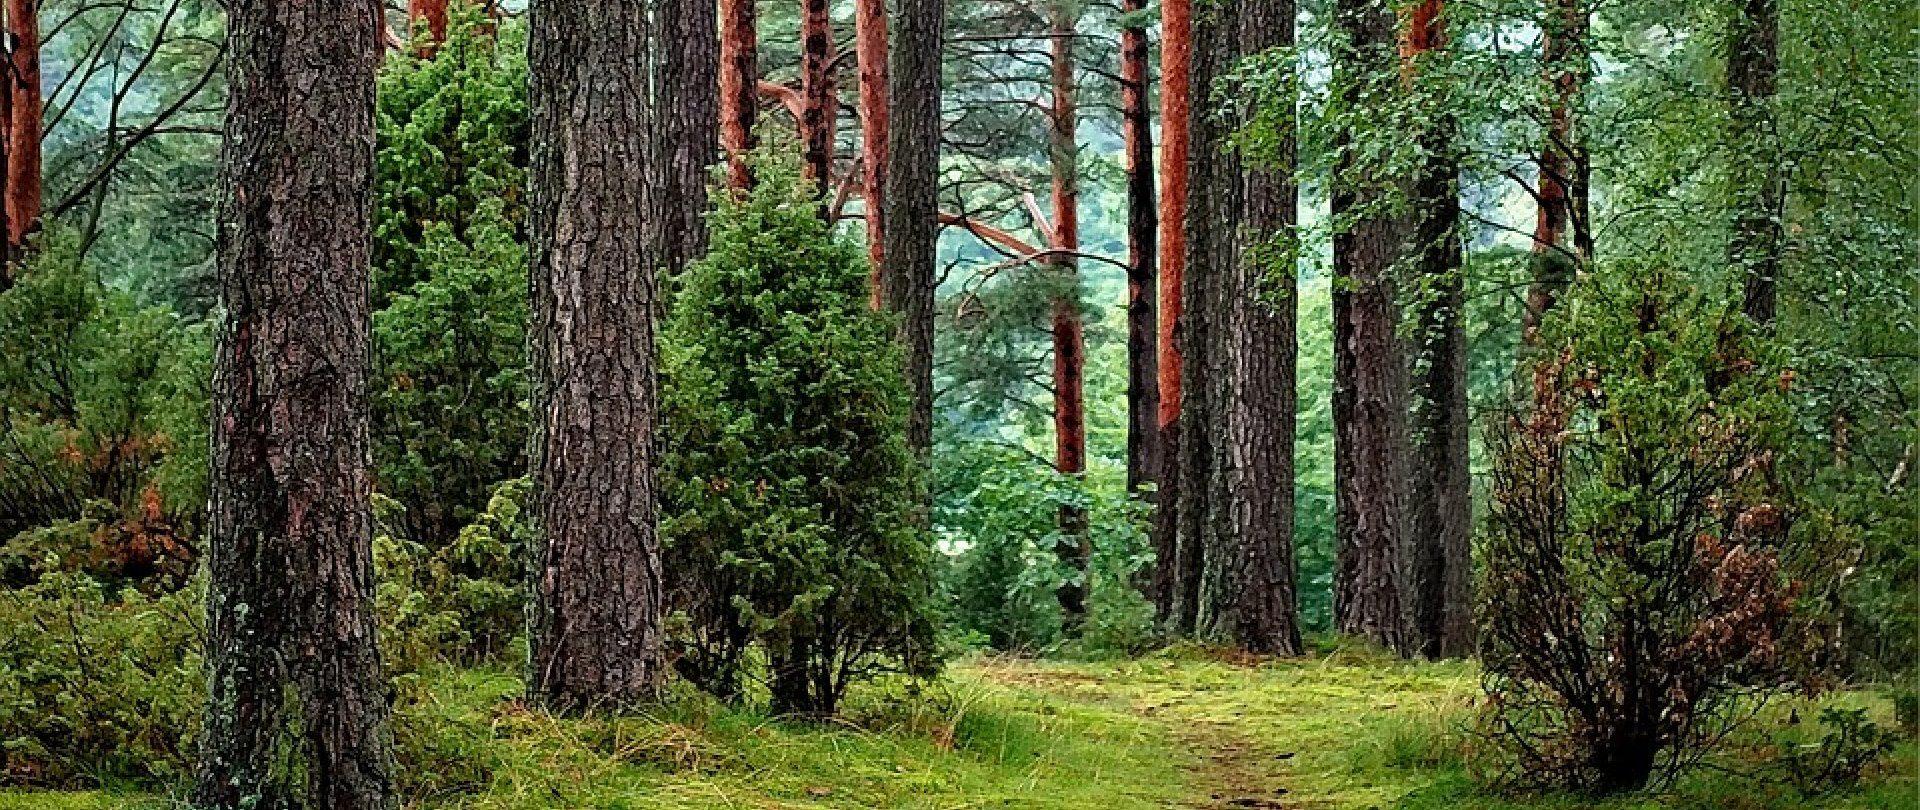 Forest treasures - Enjoy mushroom foraging